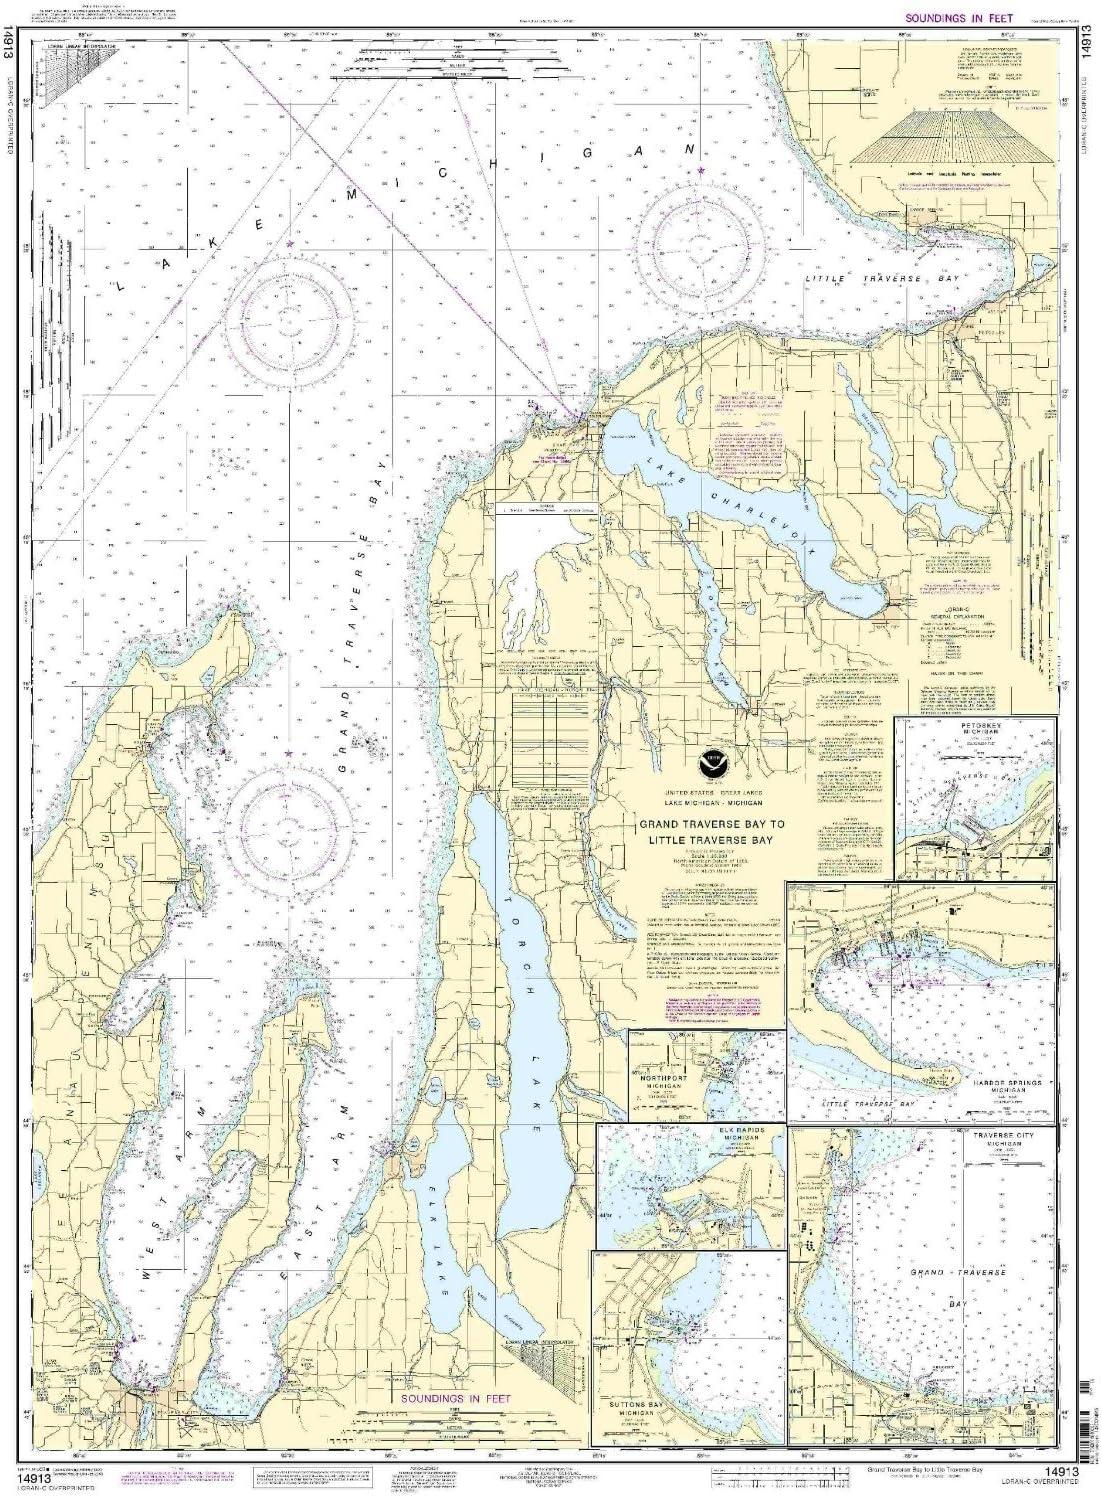 NOAA 14913-Grand Traverse Bay Little Spr 1 year warranty Harbor Over item handling to